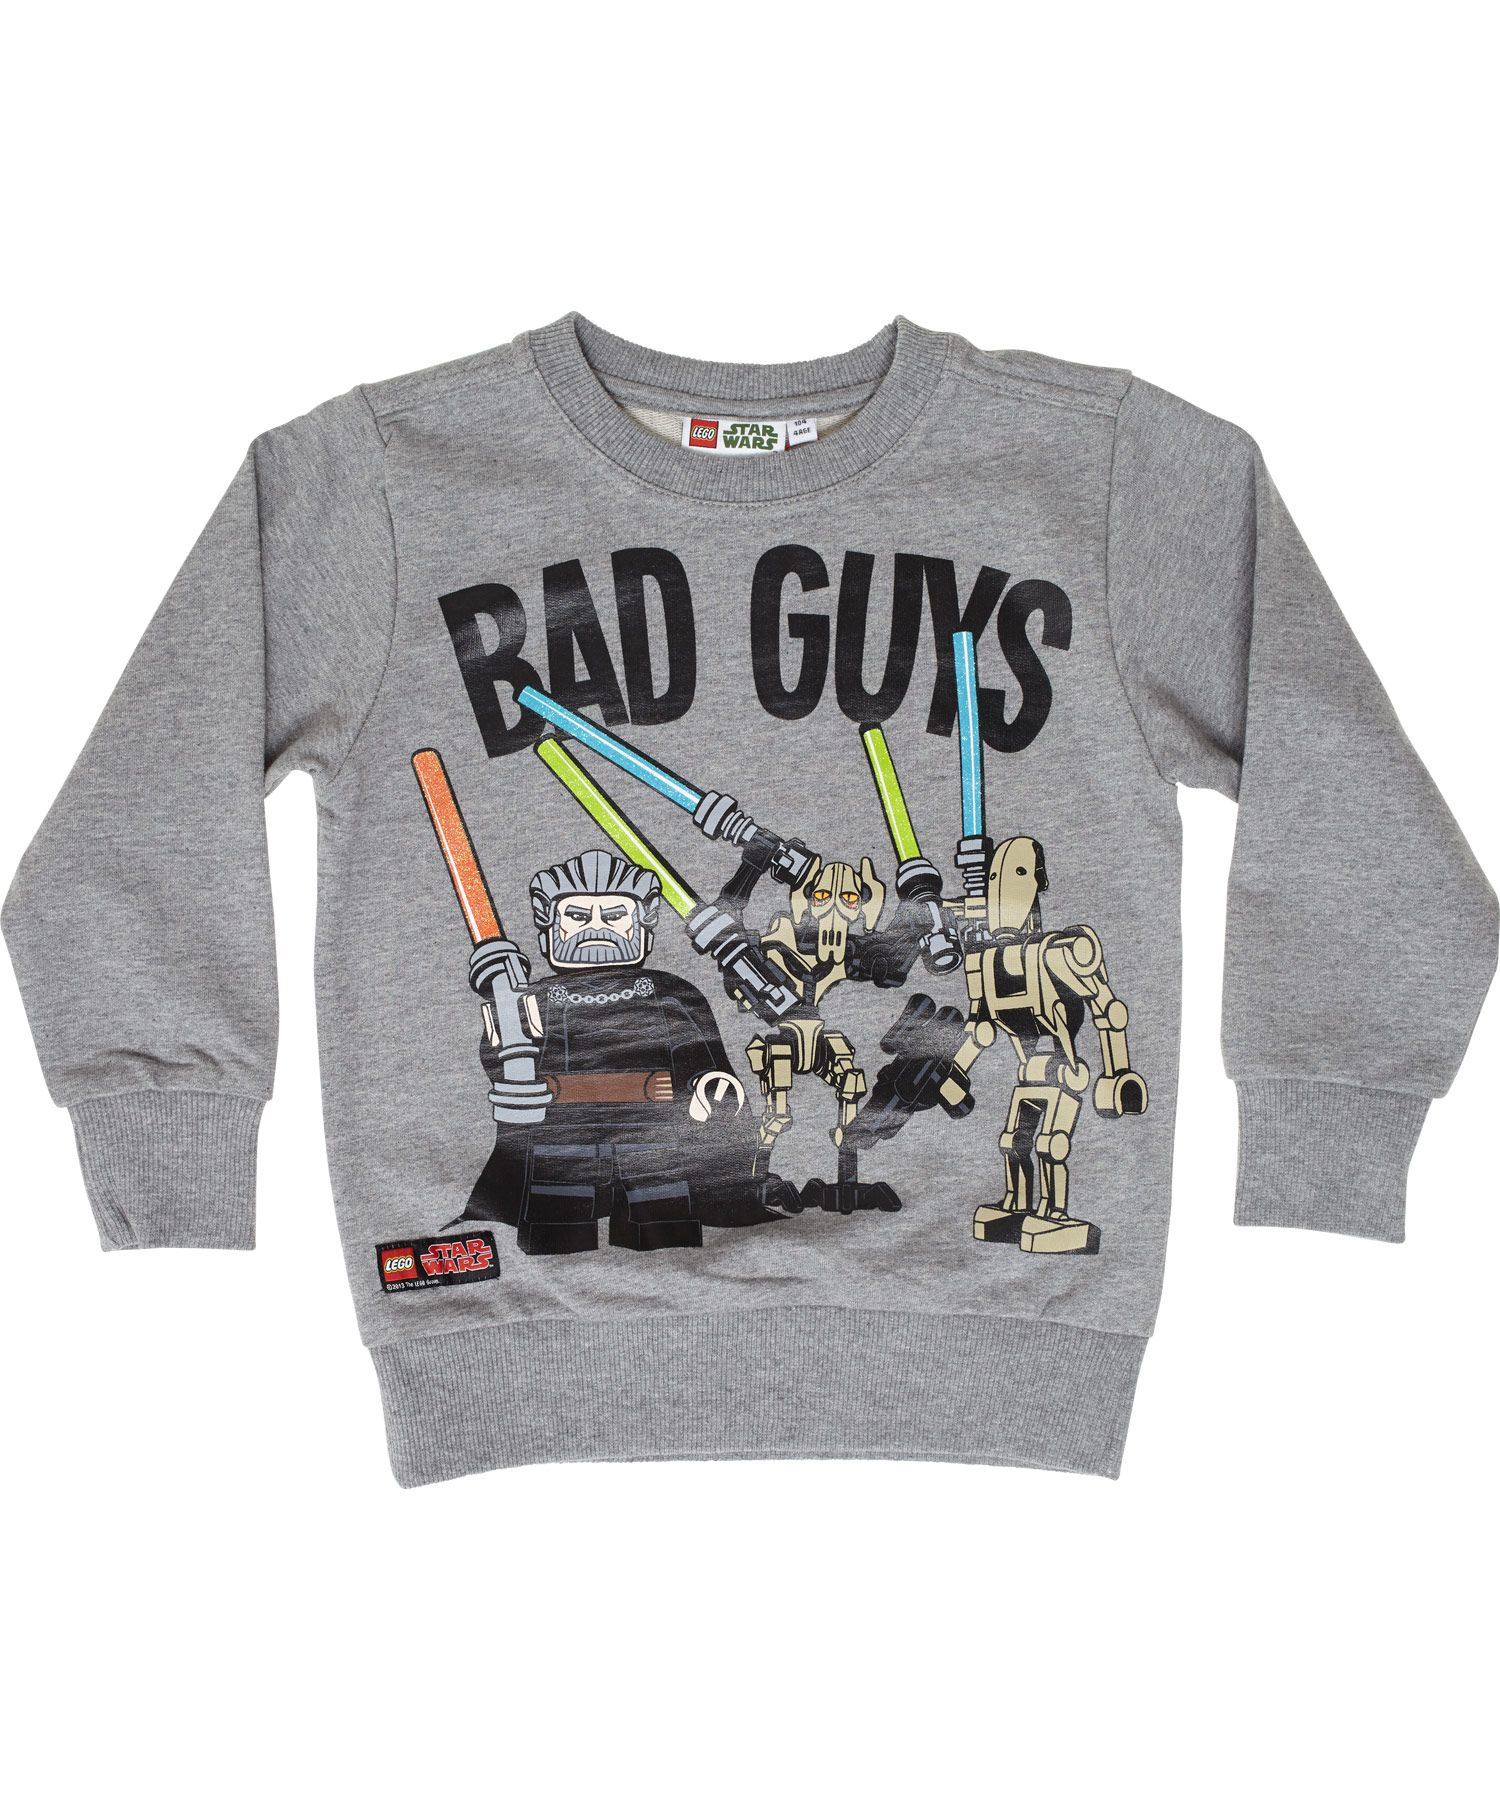 LEGO STAR WARS Boys Sweatshirt